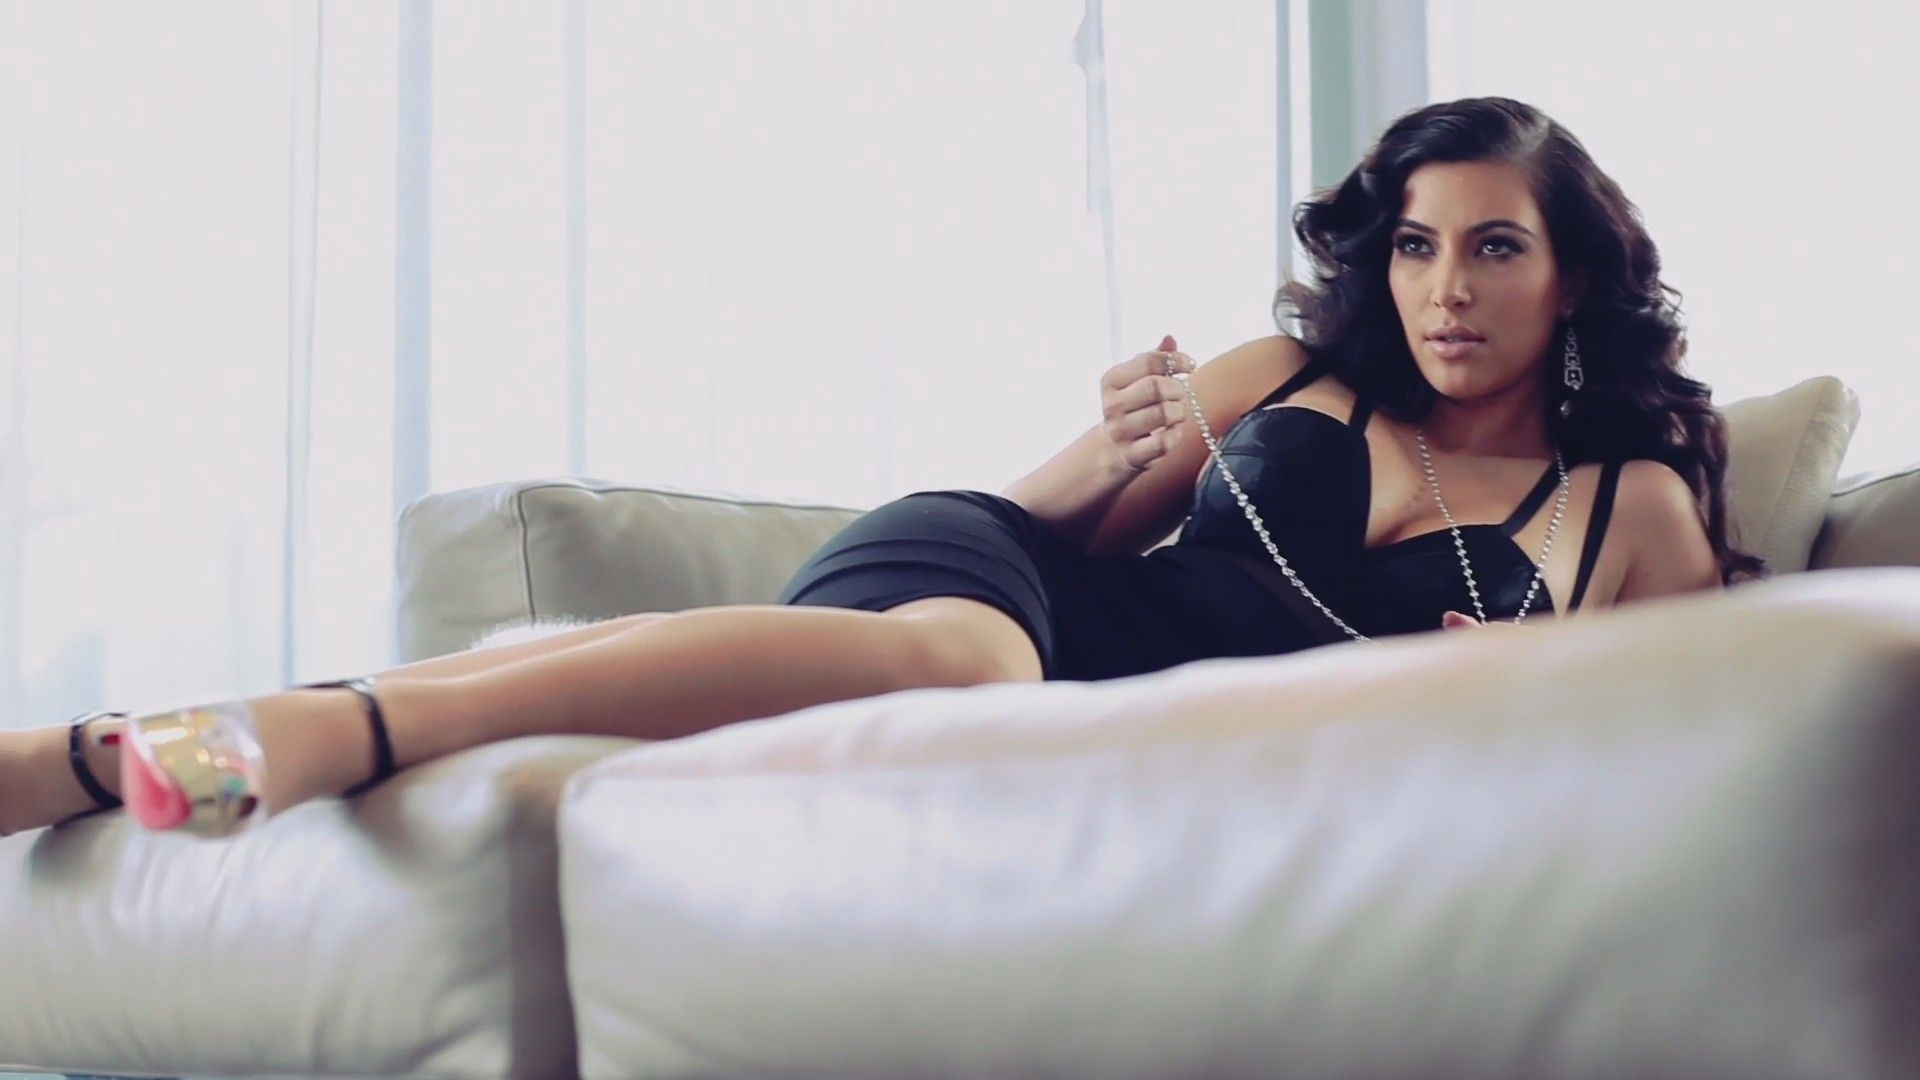 Kim Kardashian Photo Shoot HD Wallpaper Celebrities Wallpapers 1920x1080